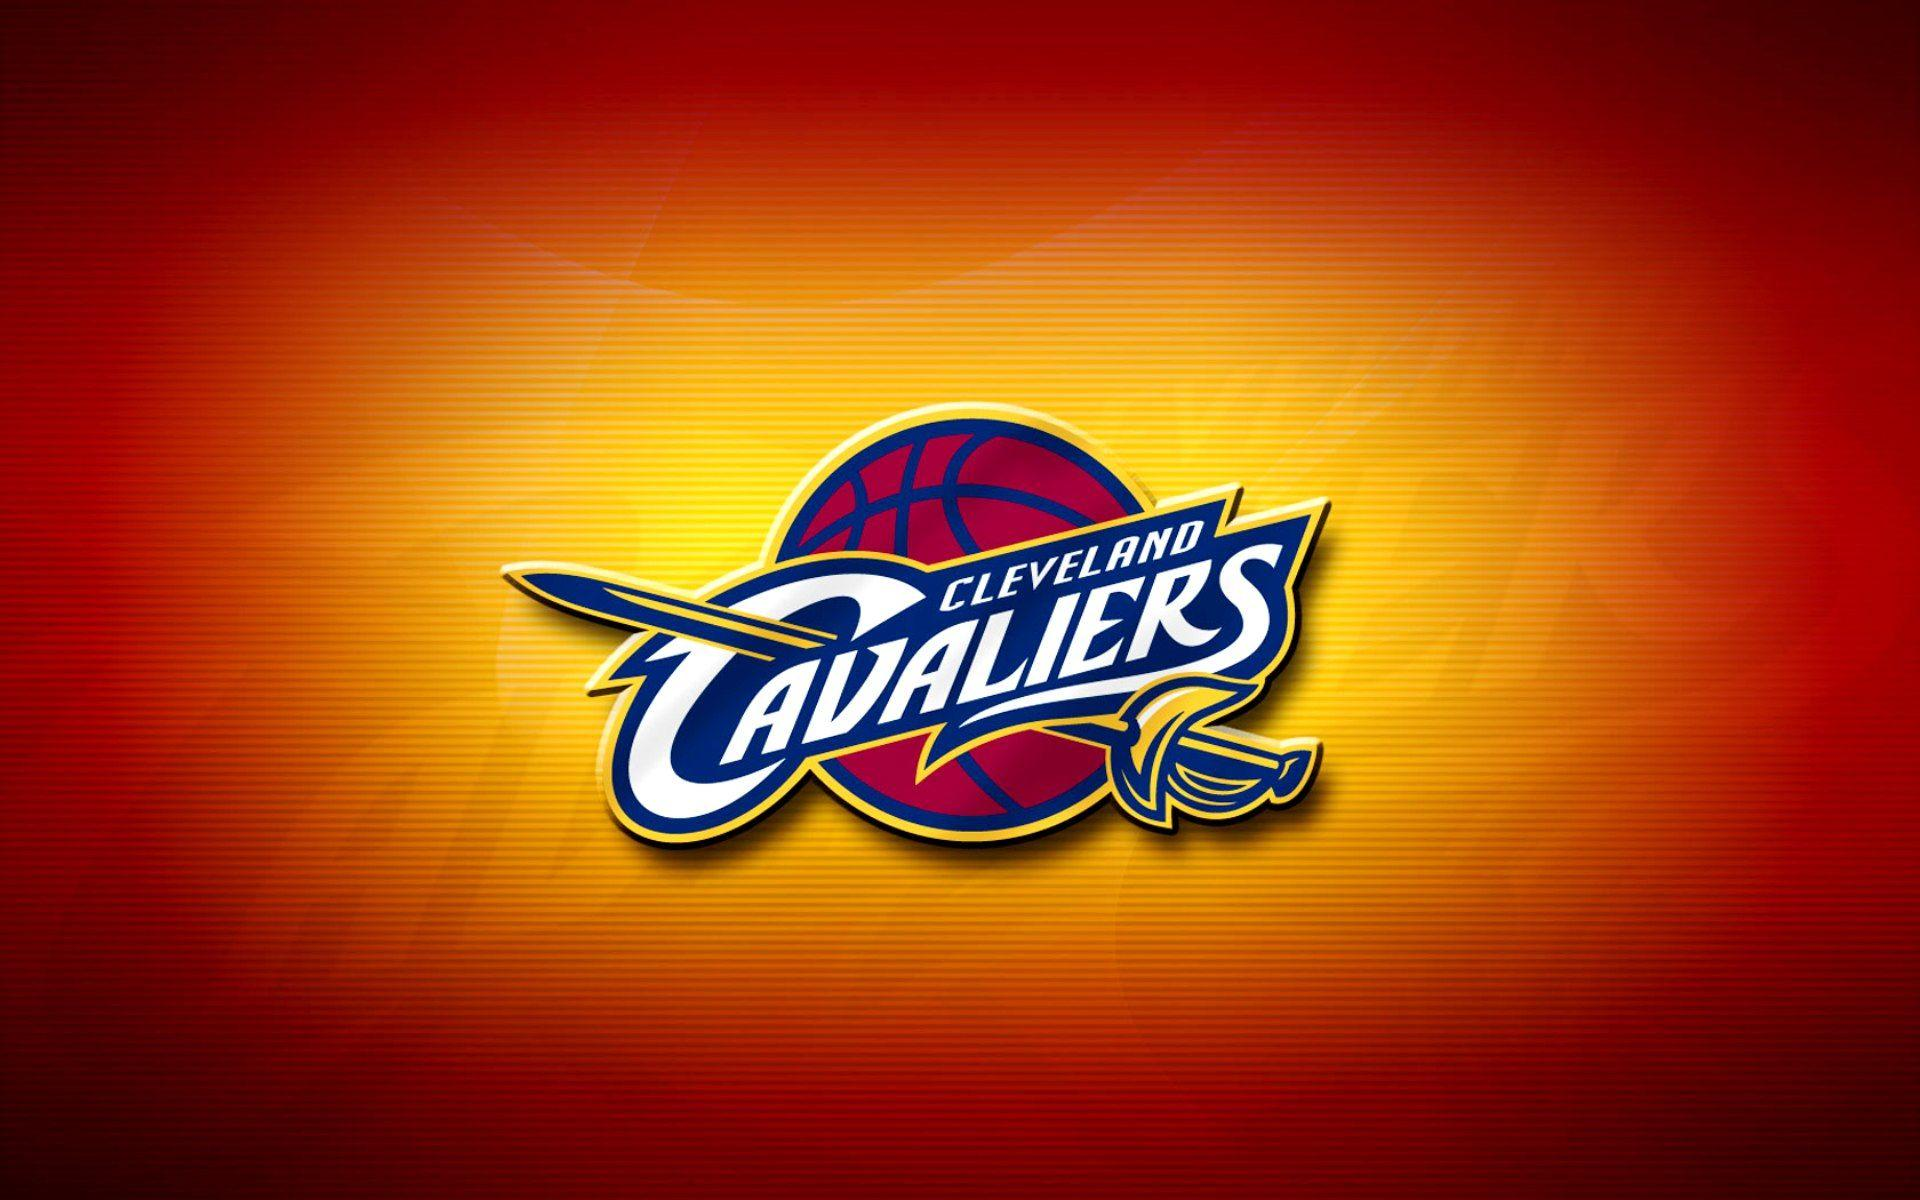 Cavaliers Logo Wallpapers